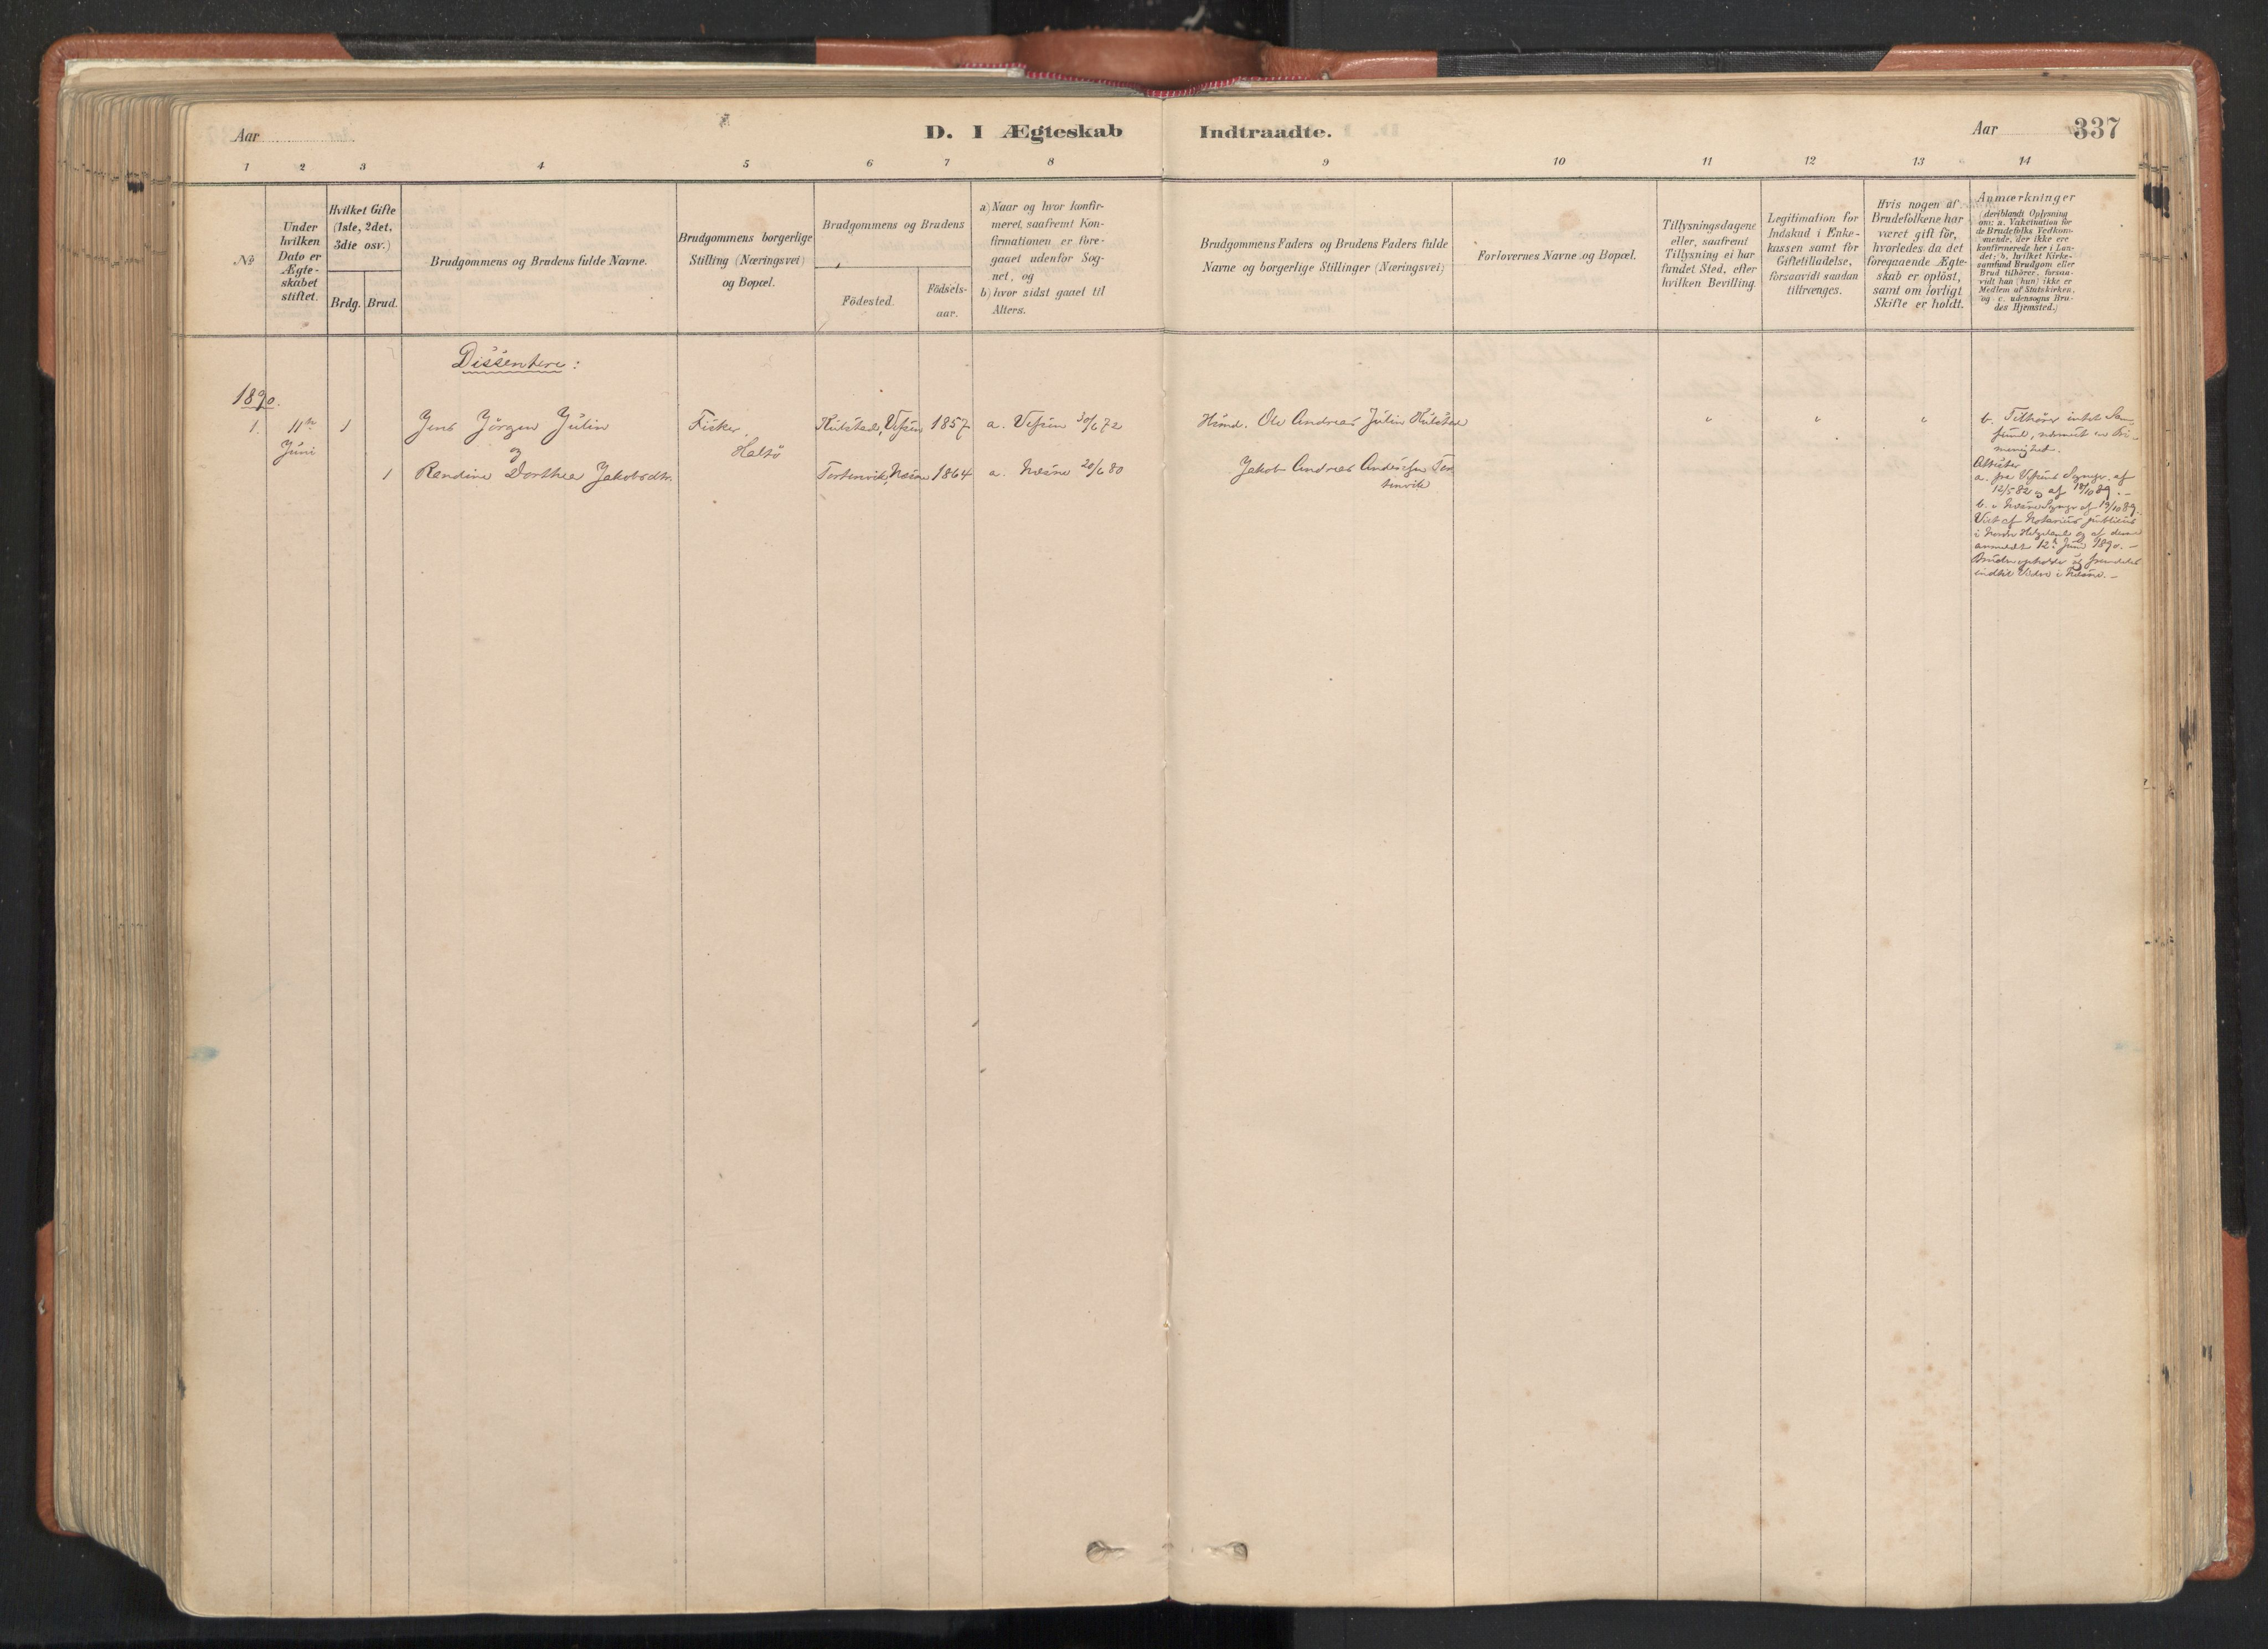 SAT, Ministerialprotokoller, klokkerbøker og fødselsregistre - Nordland, 817/L0264: Ministerialbok nr. 817A04, 1878-1907, s. 337